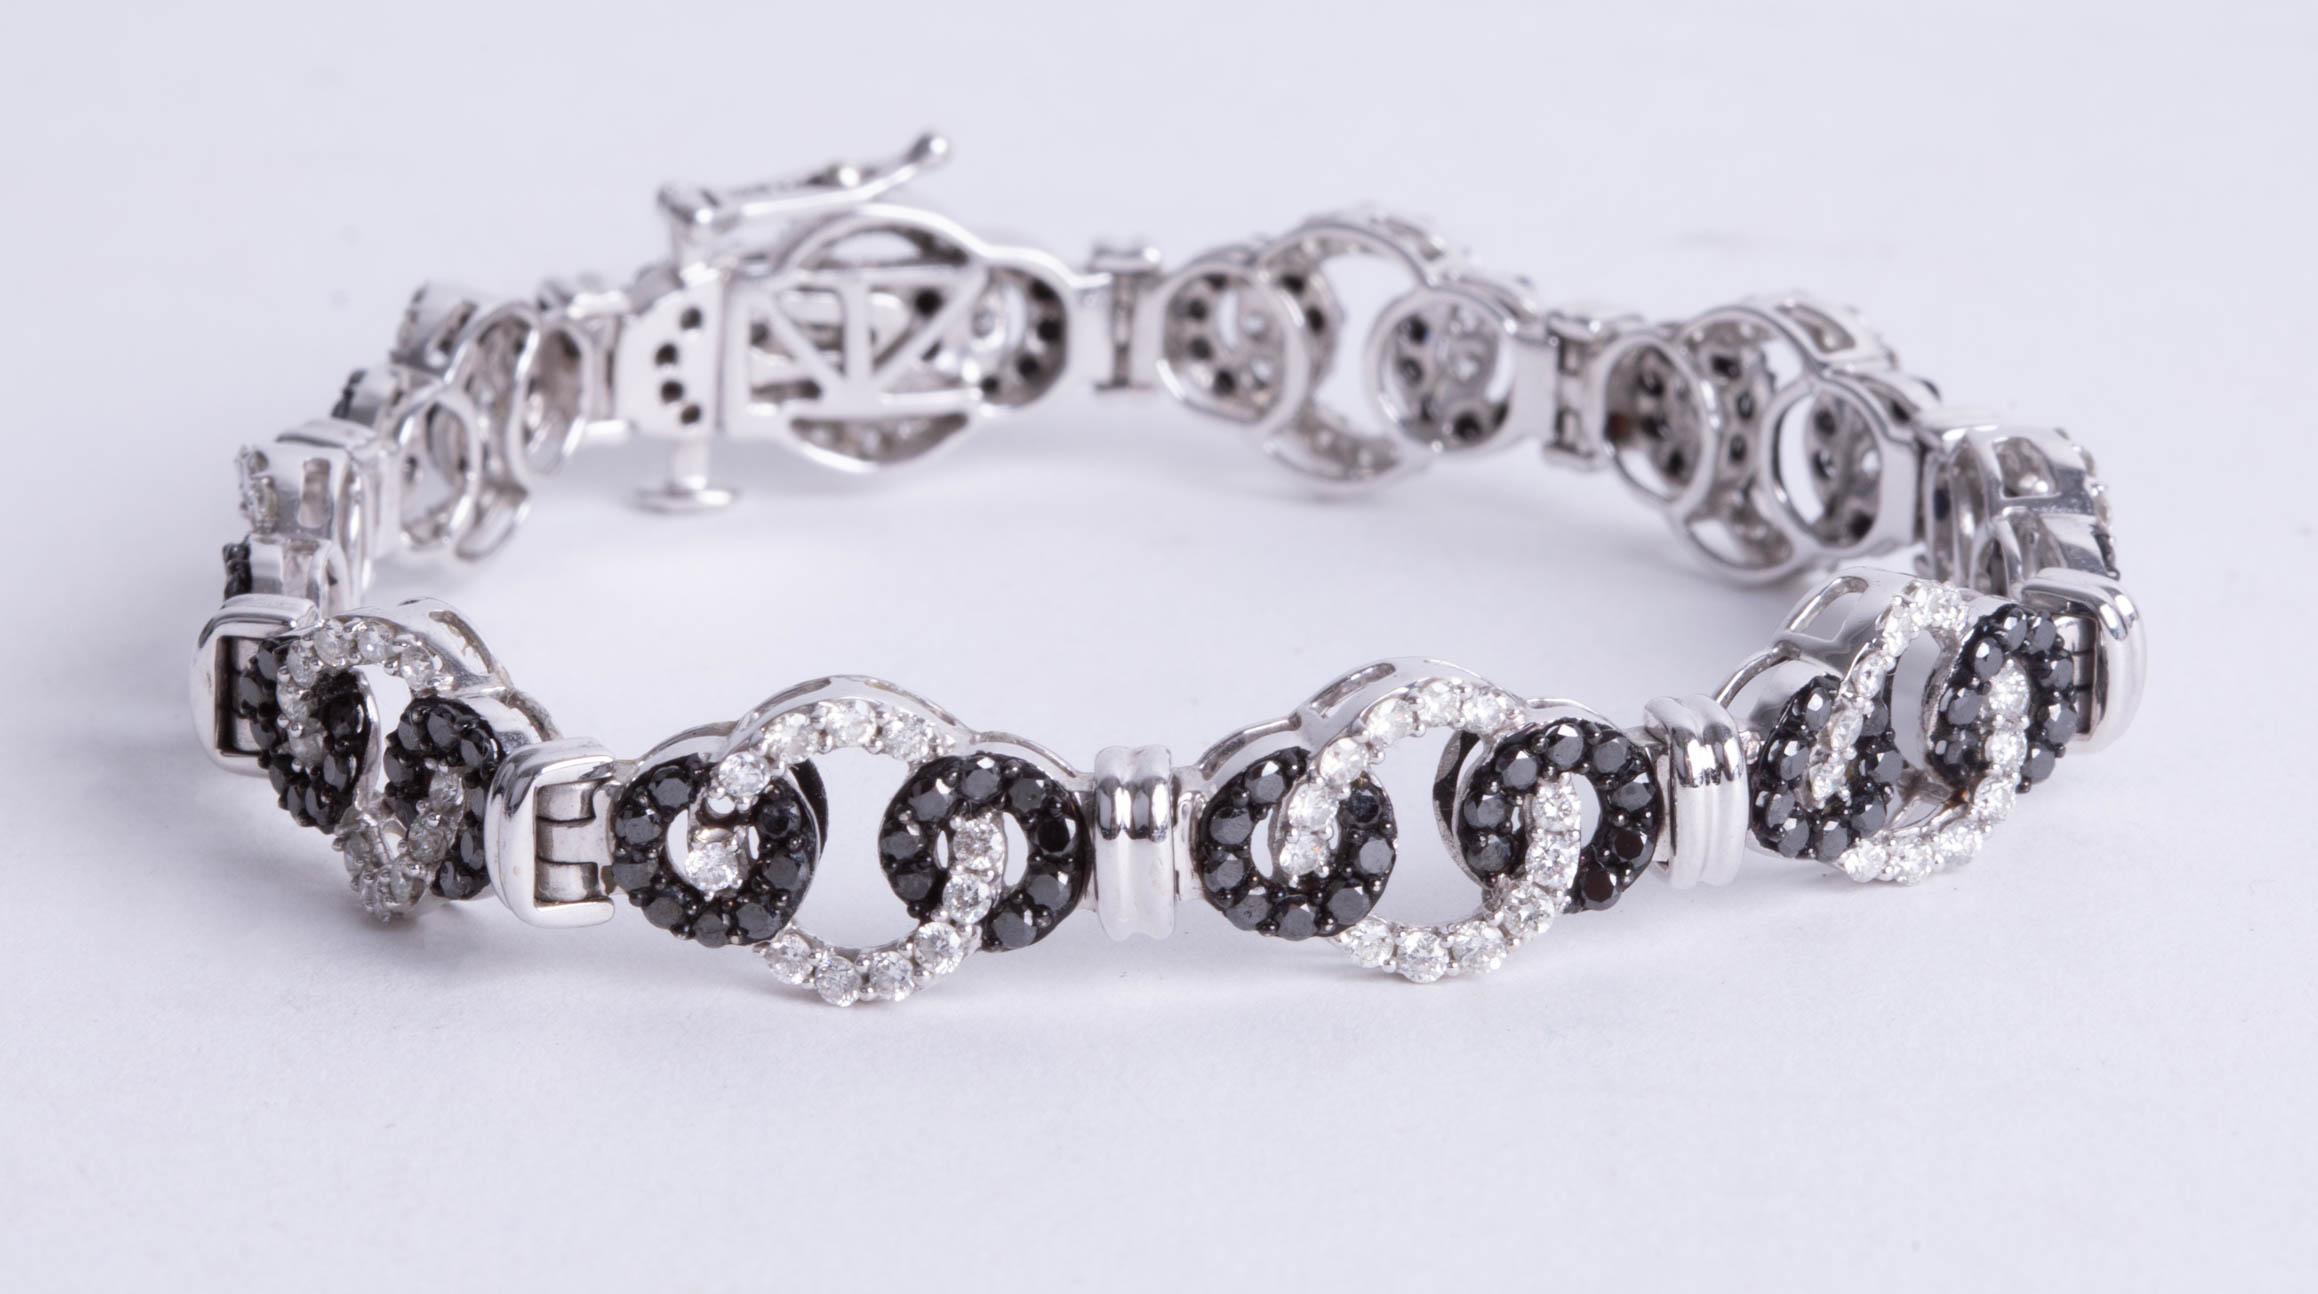 Lot 024 - A contemporary white gold black and white diamond bracelet, length 19cm.